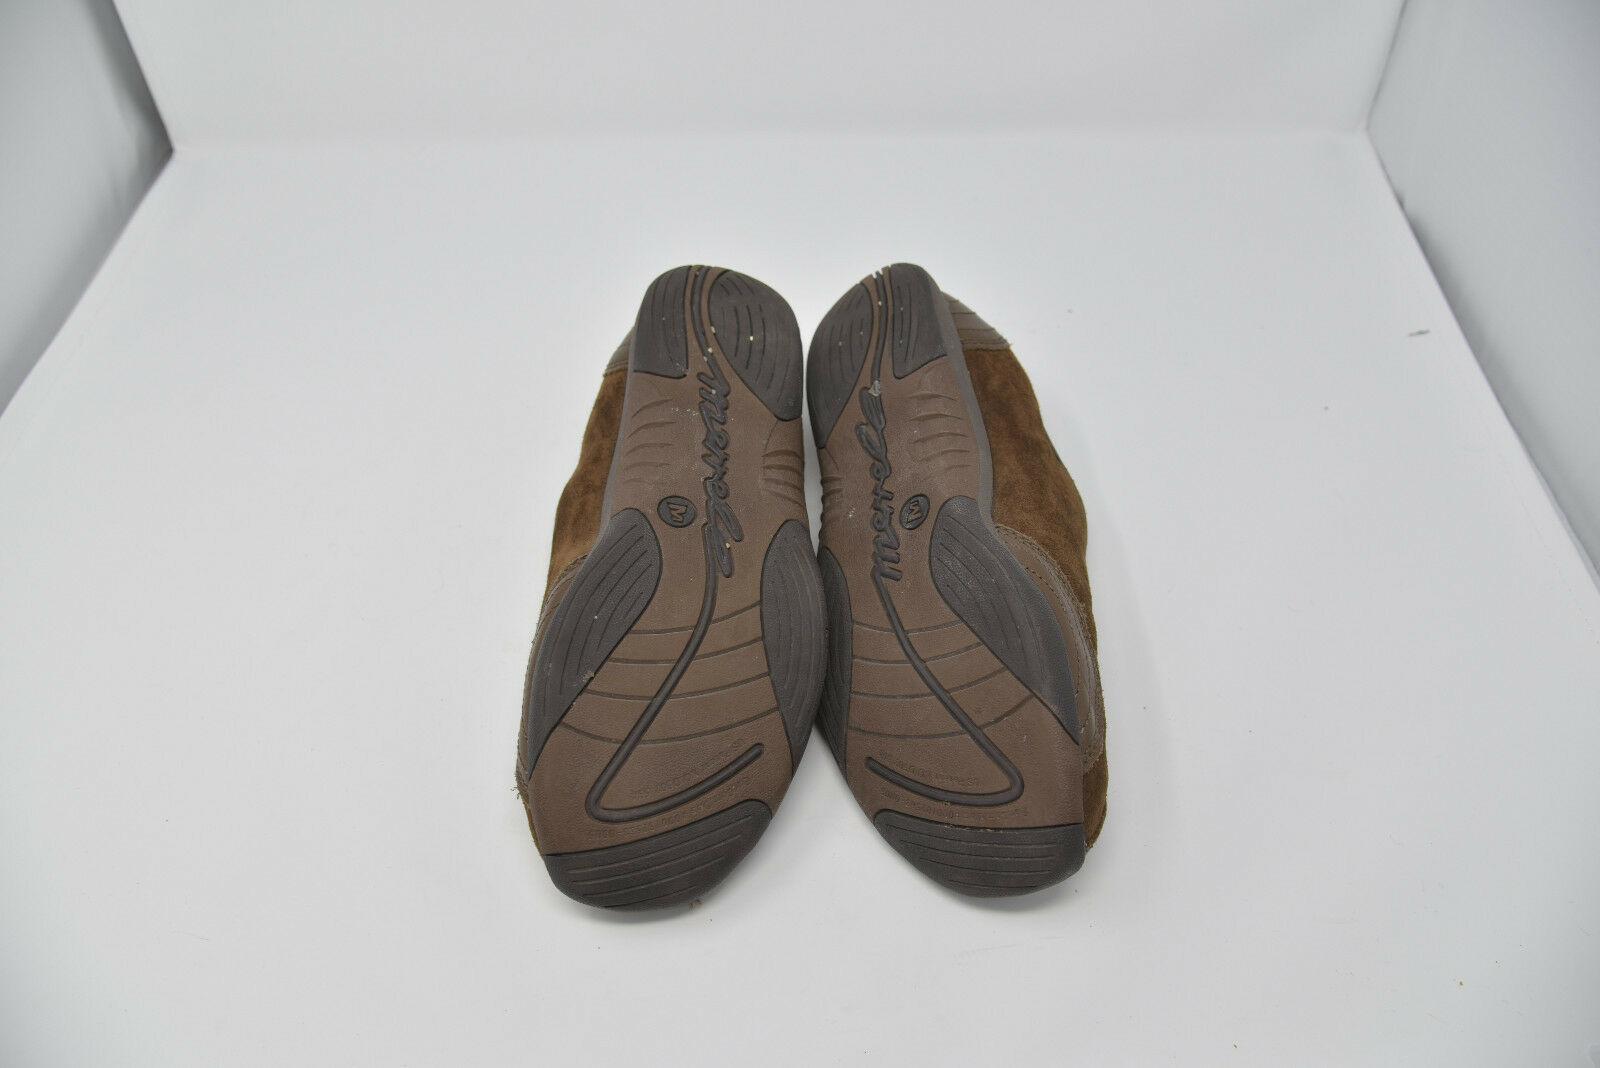 Merrell Womens Sz 10 EU 41 Brown Suede Zip Up Walking Flats Loafers J173241C